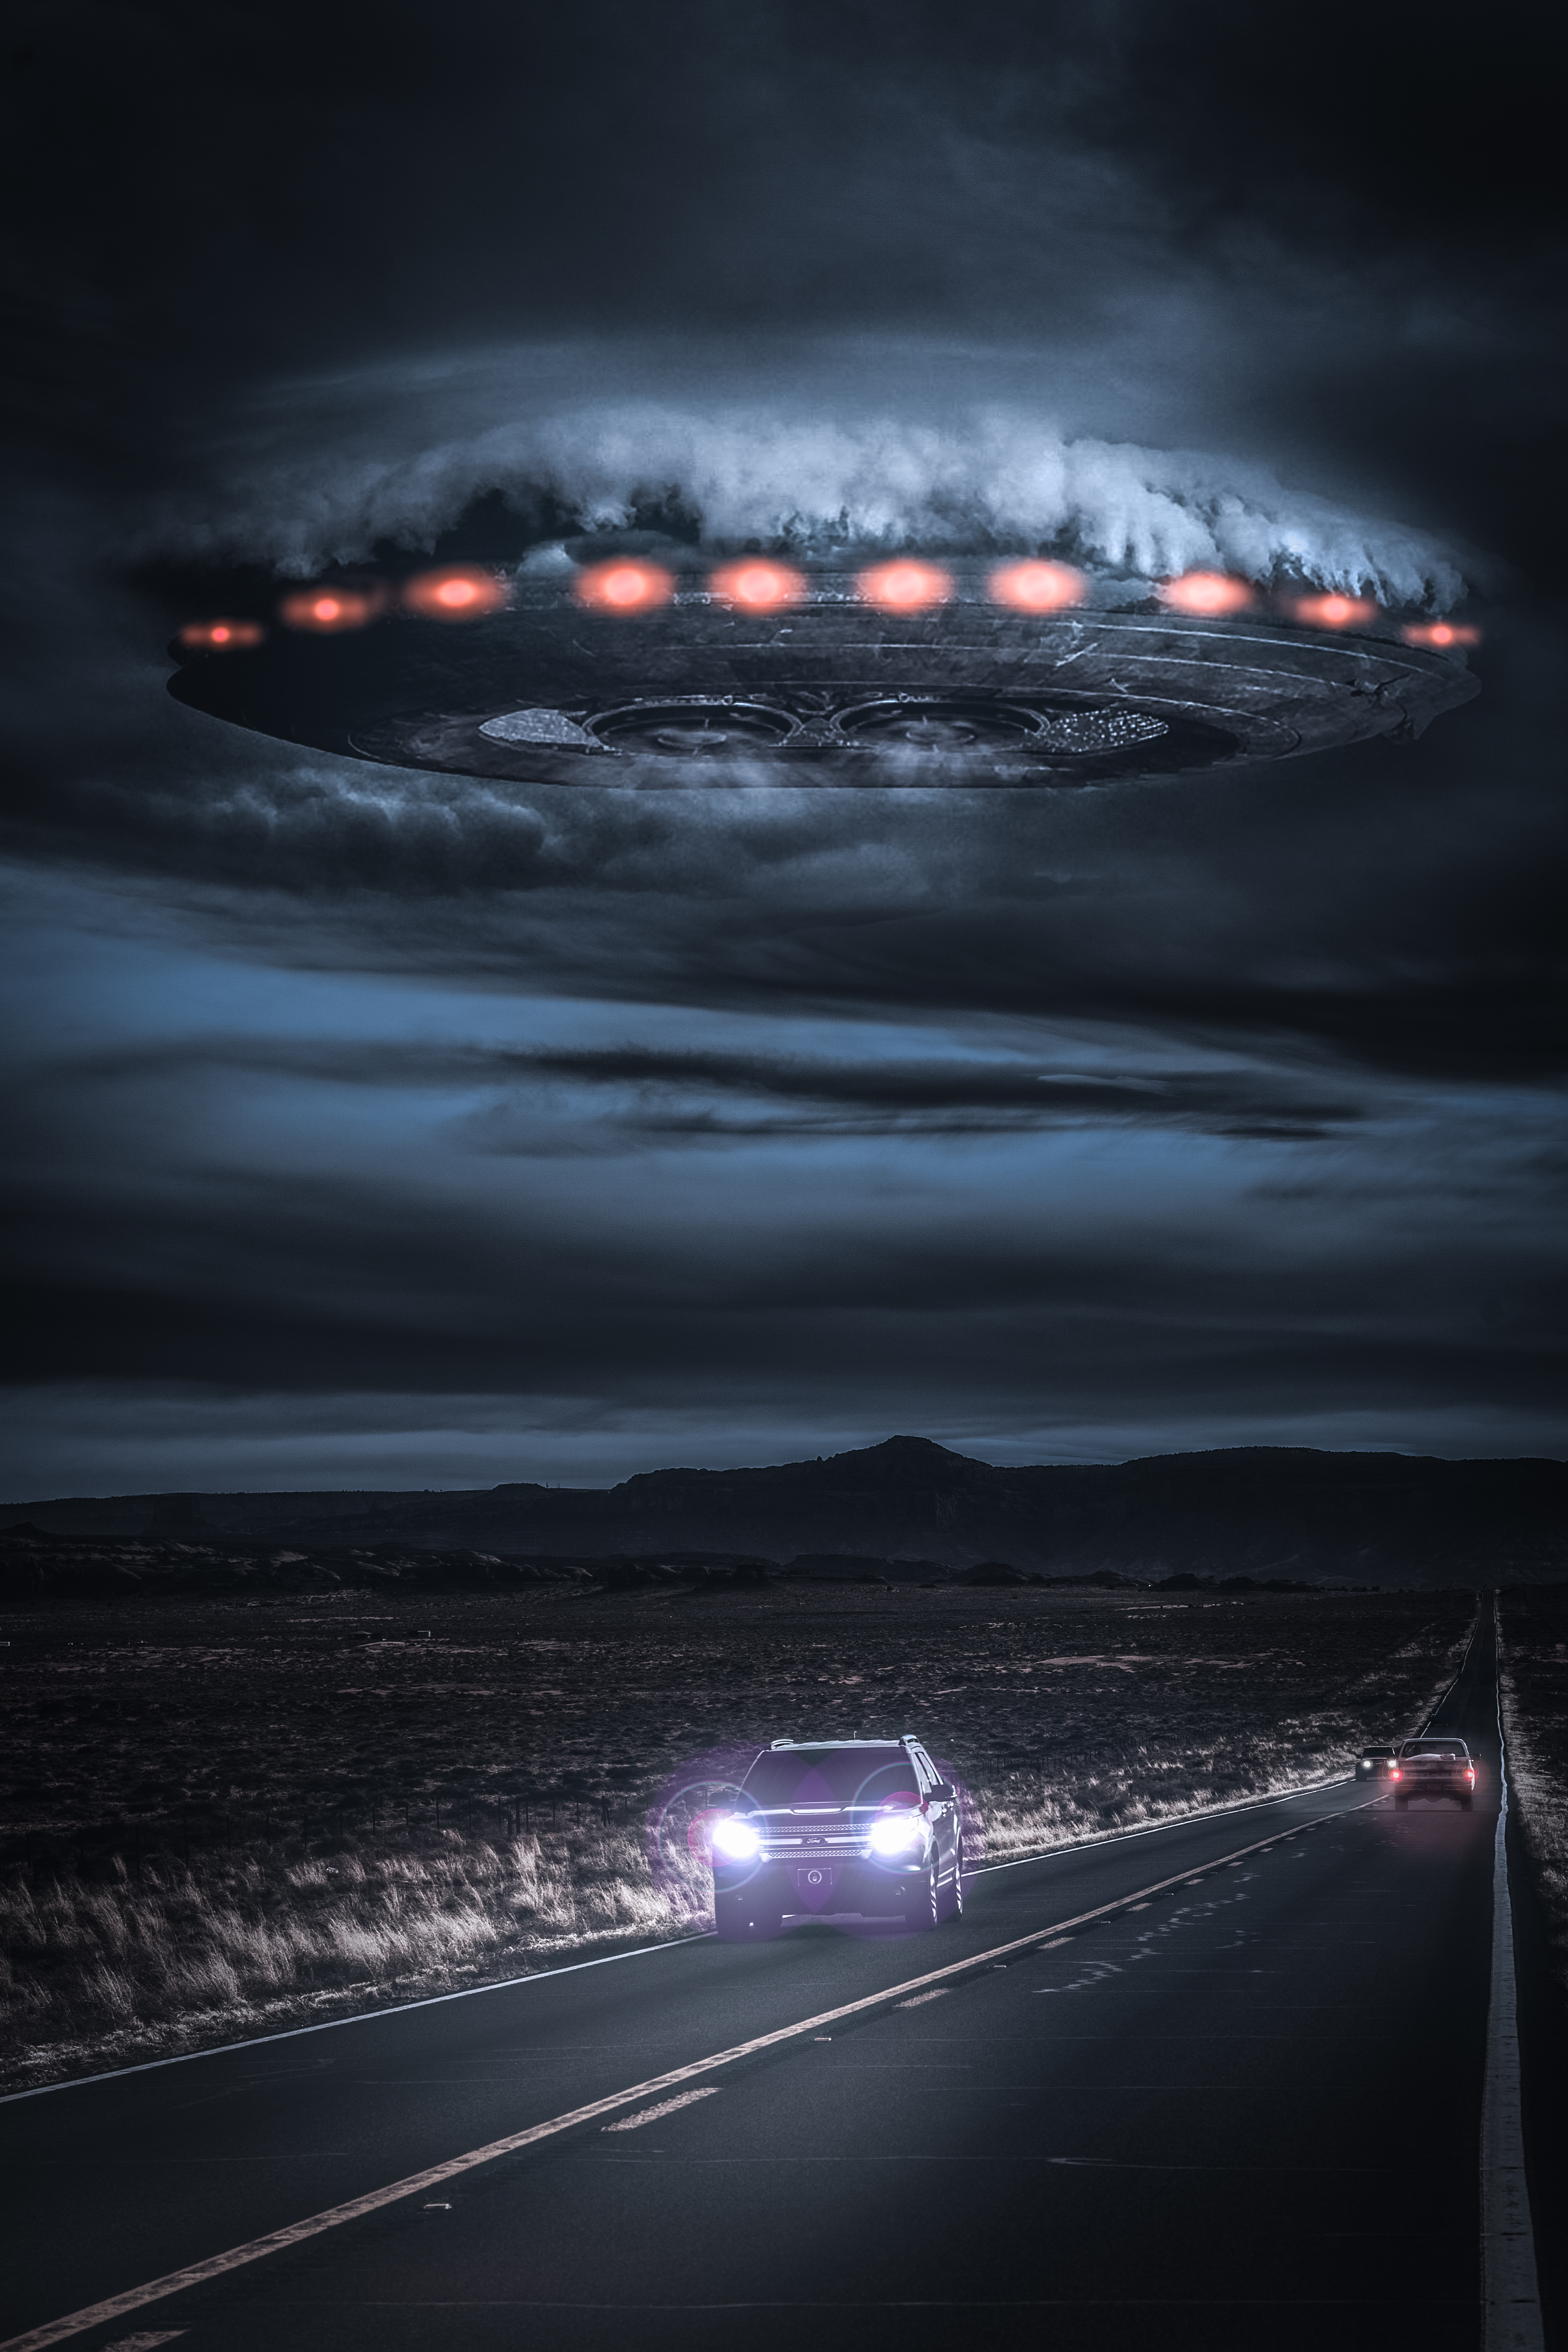 UFO over desert Highway